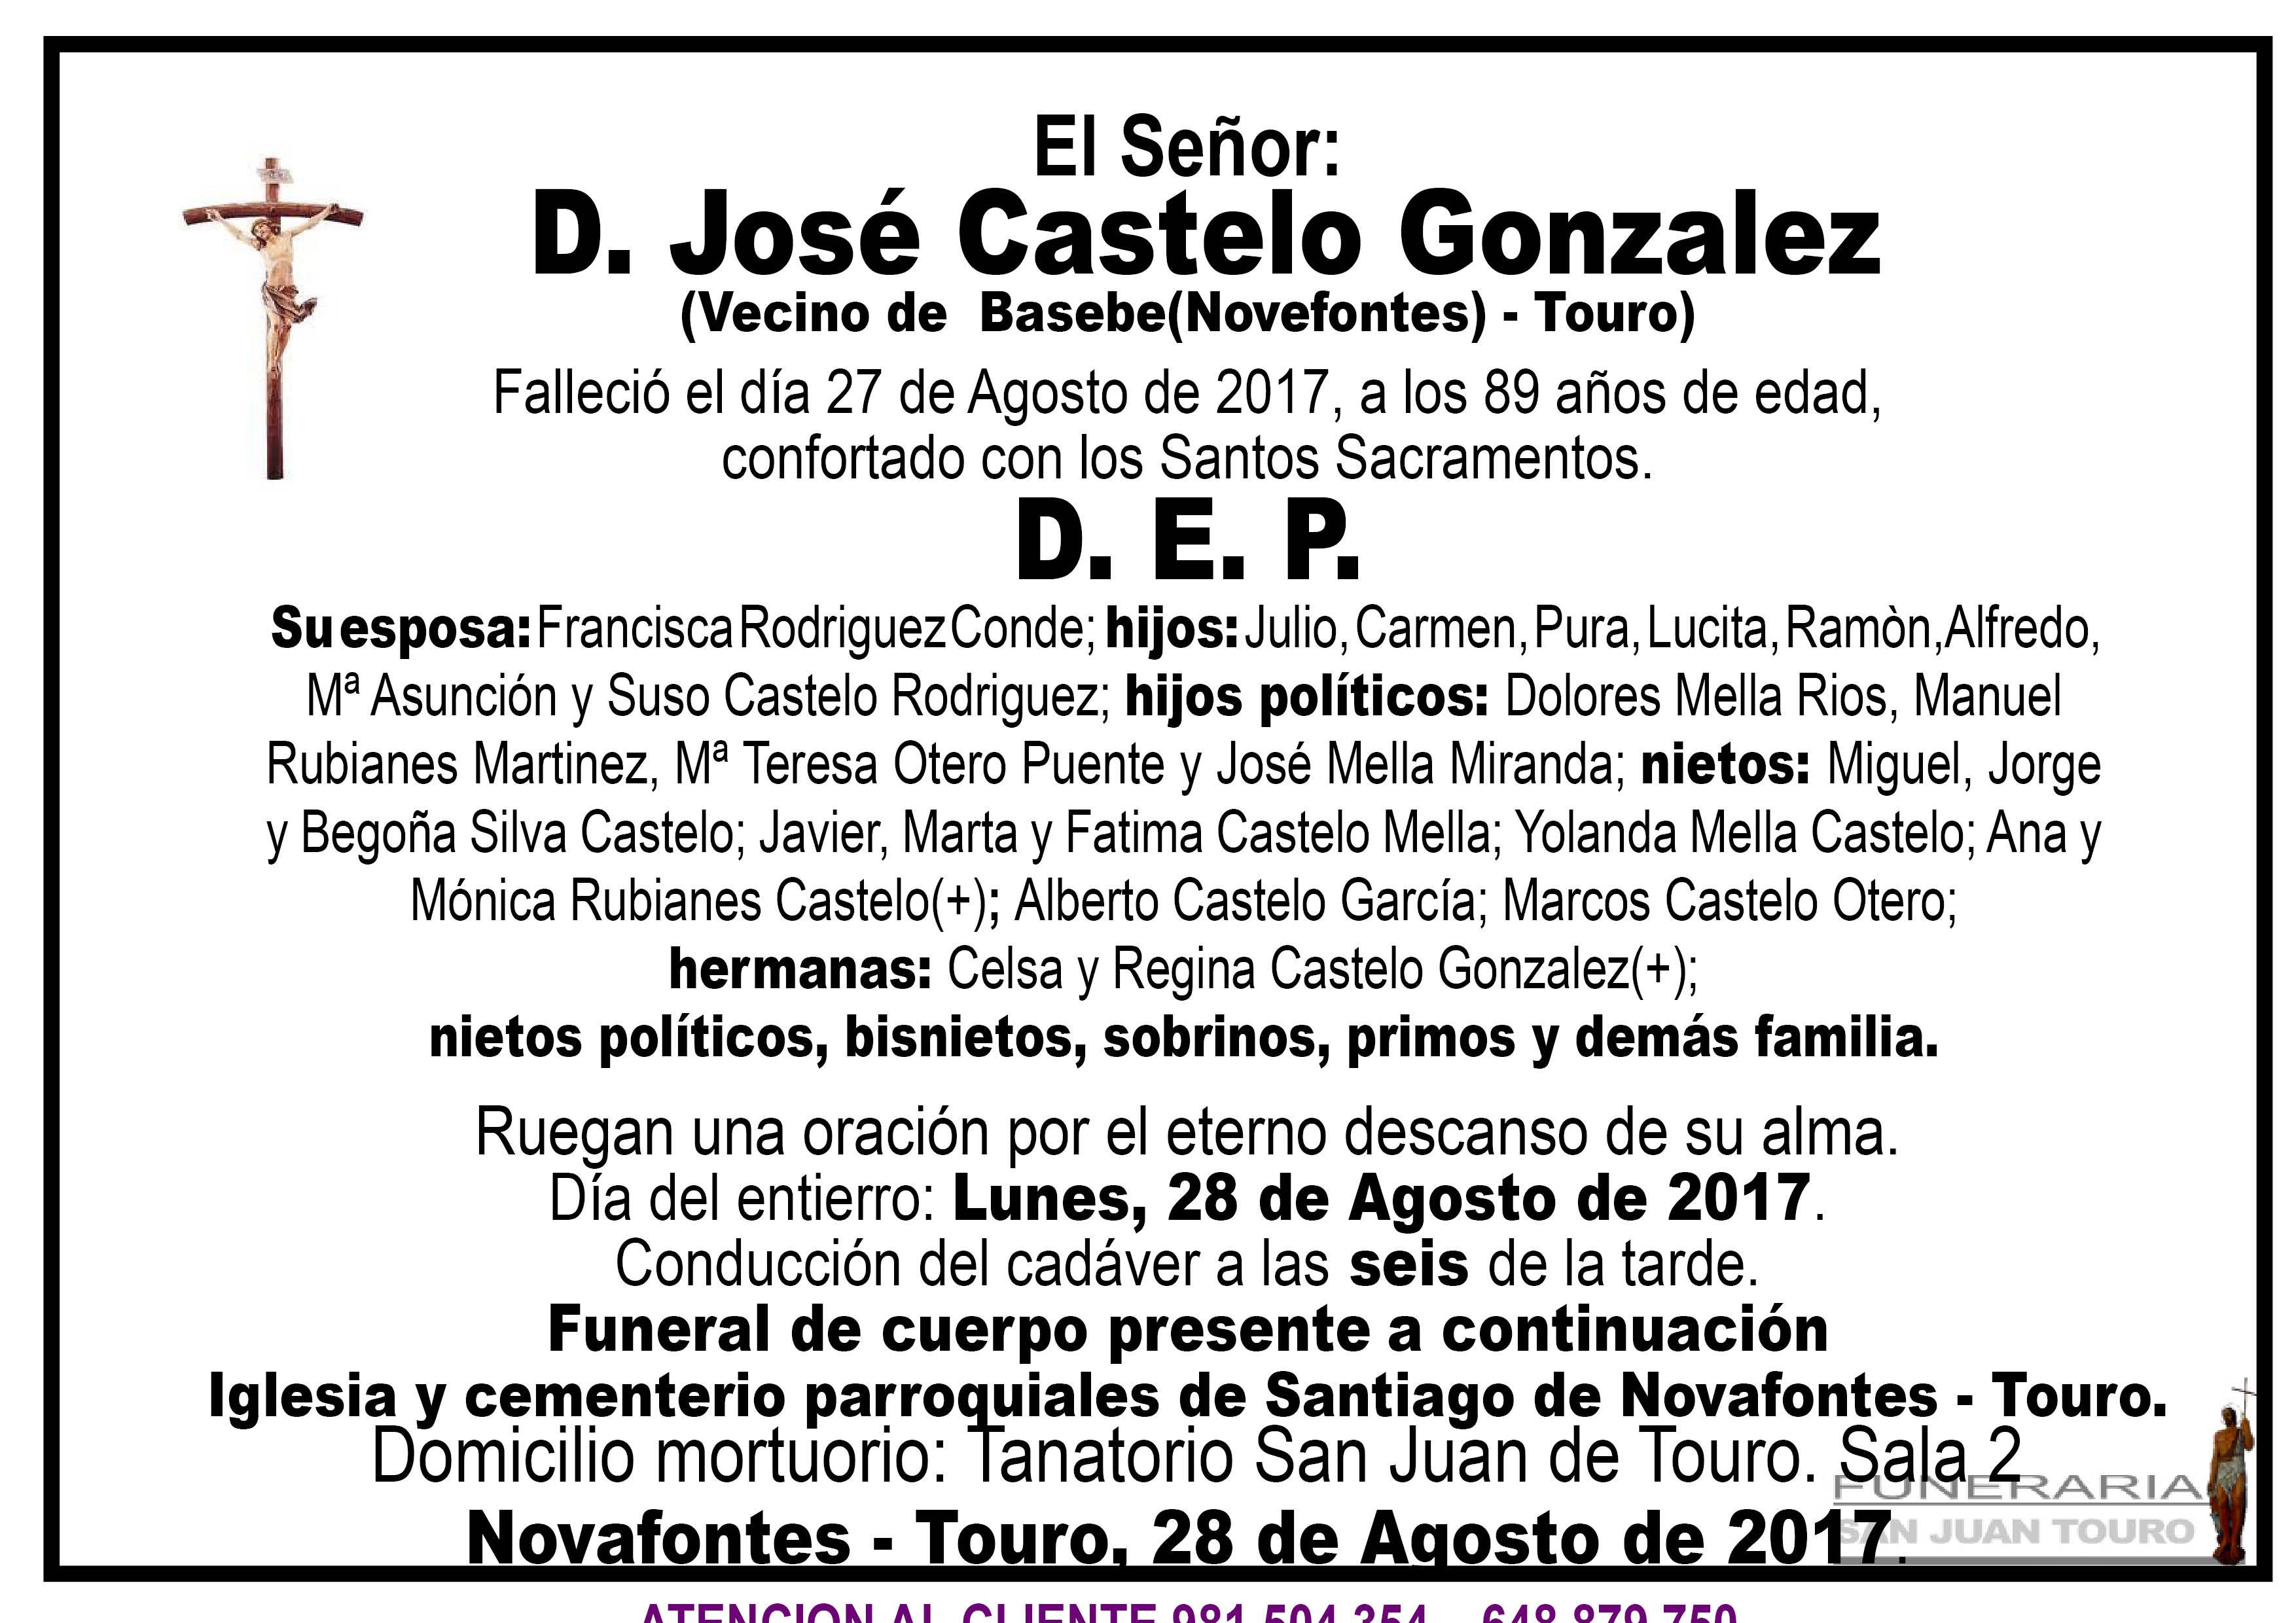 Esquela de SEPELIO DE D. JOSE CASTELO GONZALEZ